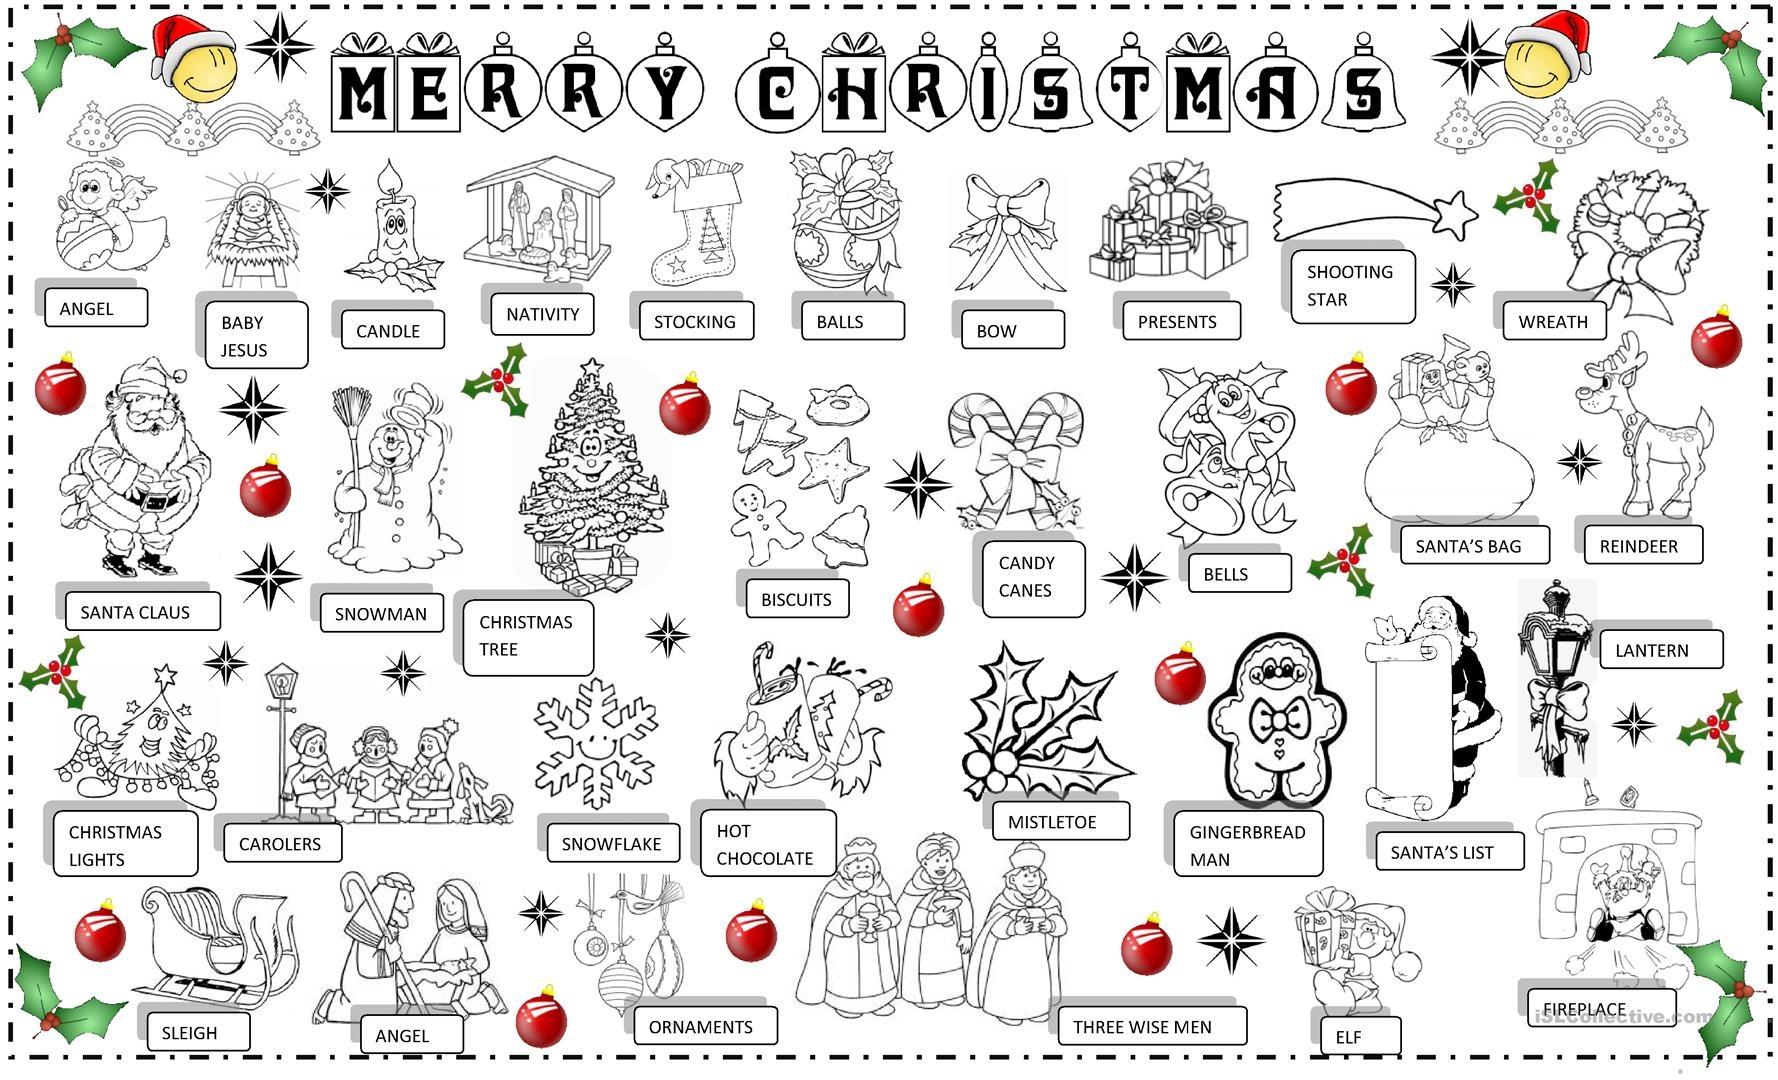 Christmas Pictionary Worksheet - Free Esl Printable Worksheets Made - Free Printable Christmas Pictionary Words